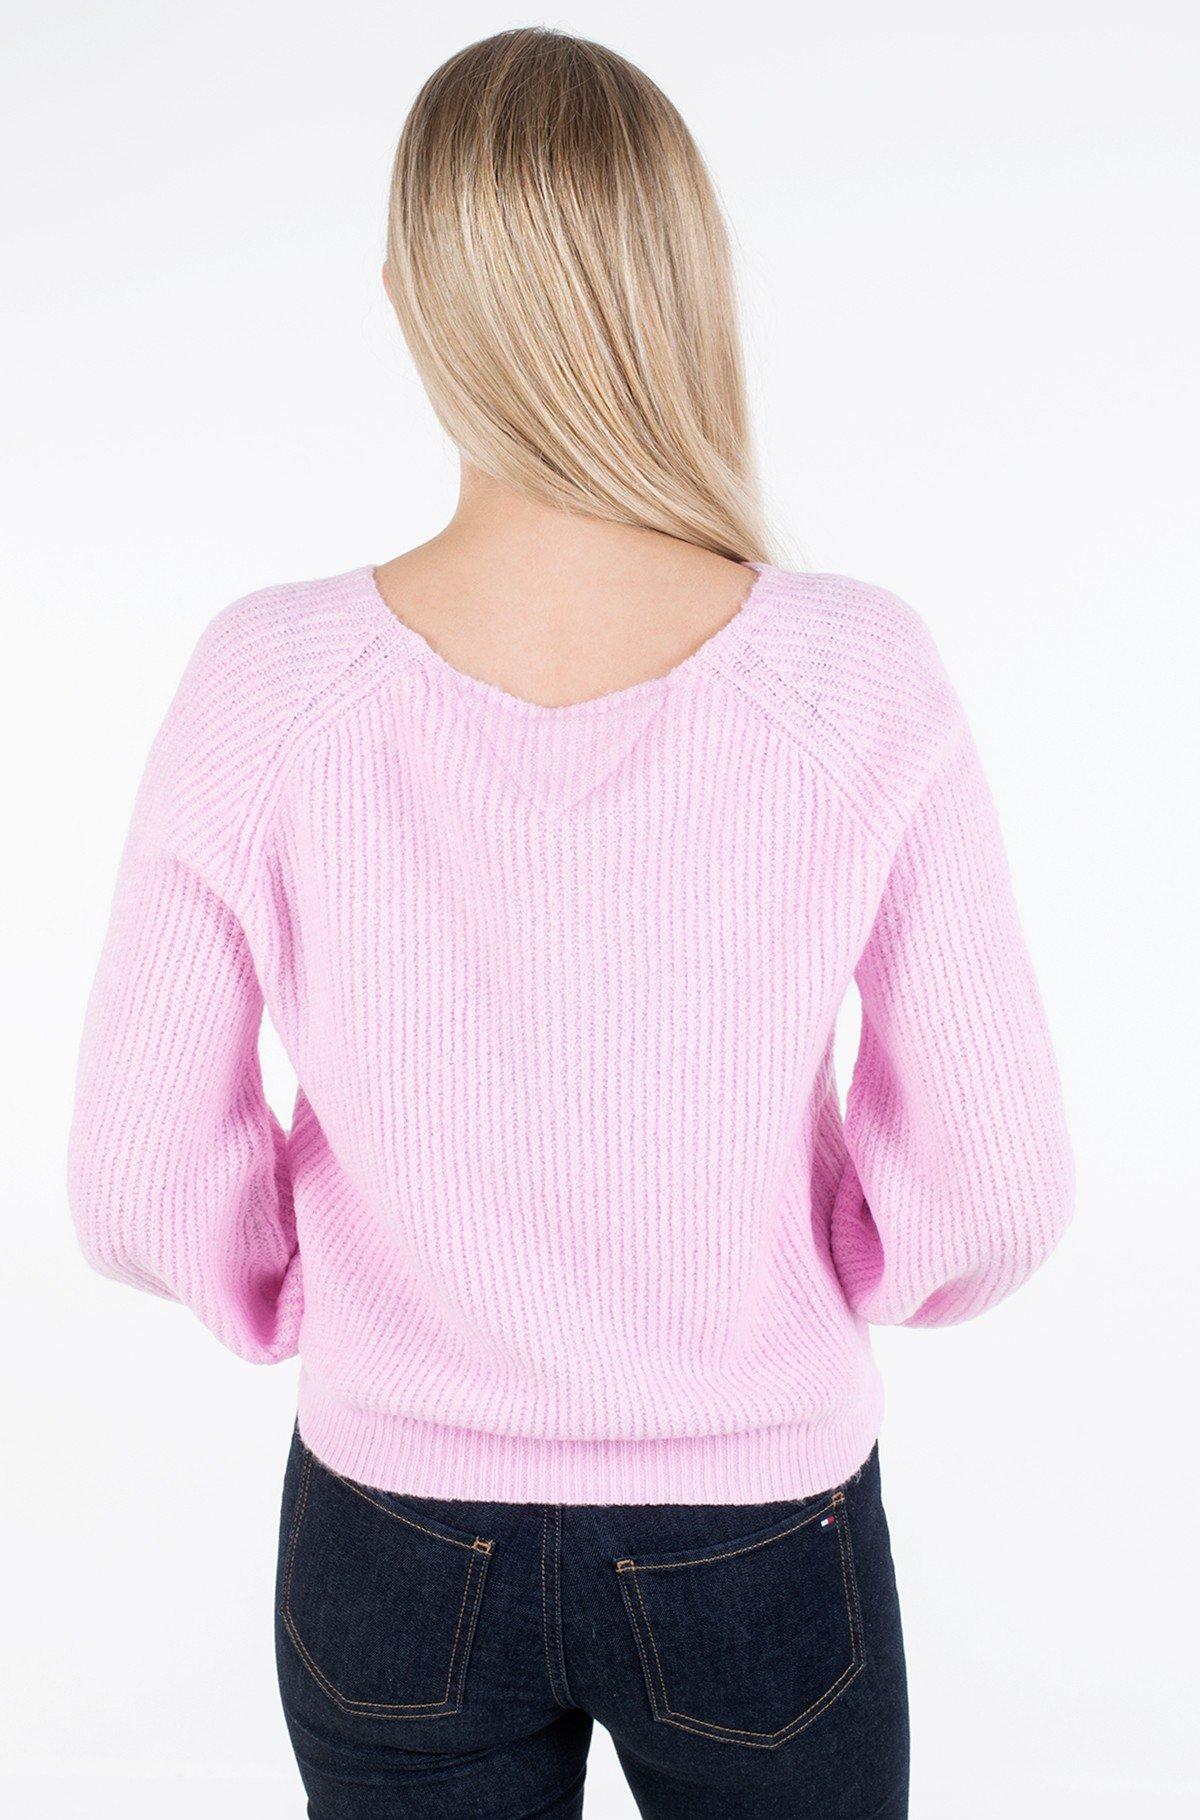 Sweater TJW SLEEVE DETAIL LOGO SWEATER-full-3